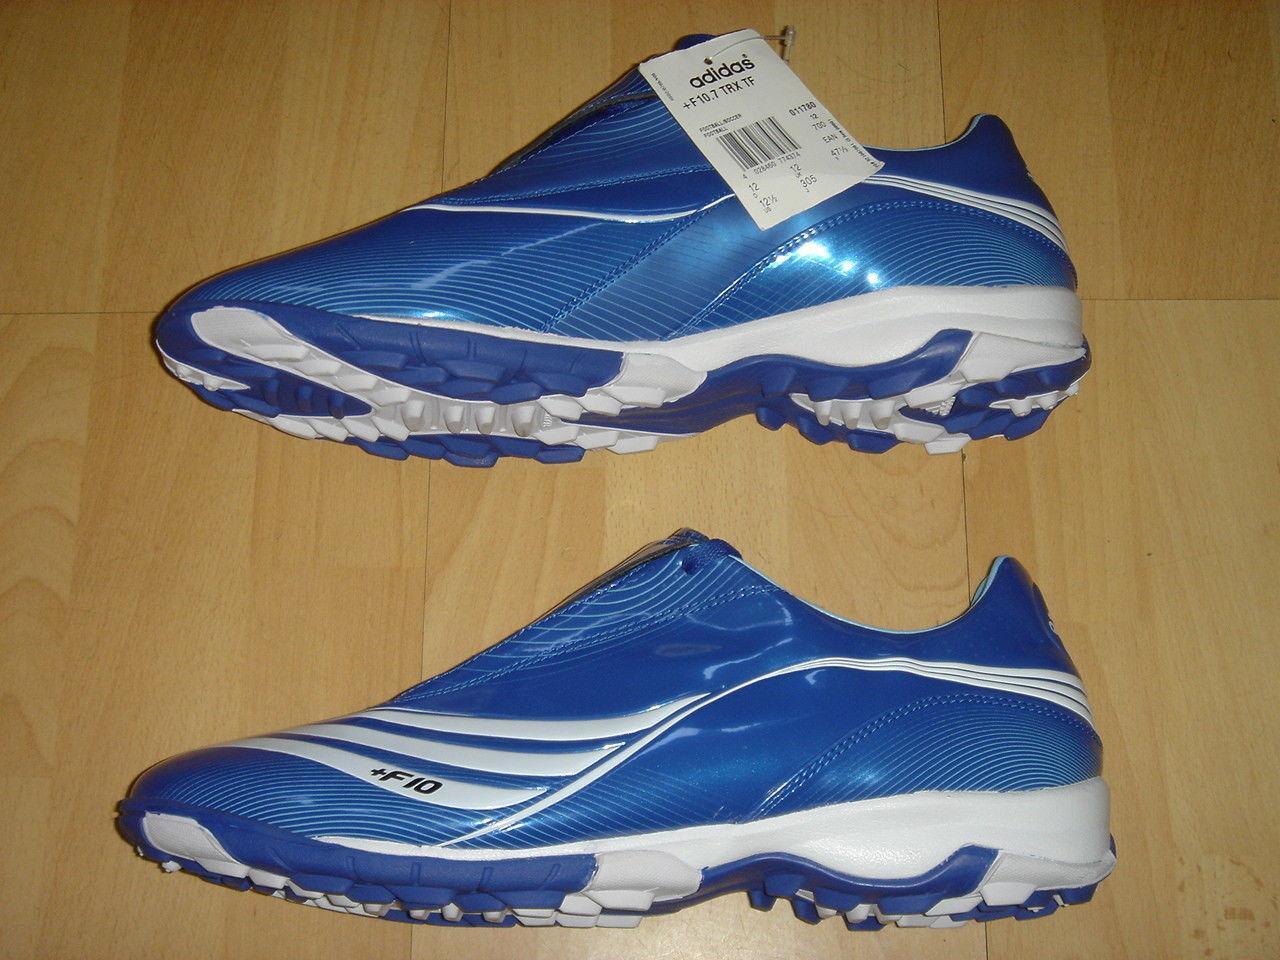 Adidas Soccer Shoes F10.7 TRX TF Football Astros Blue New